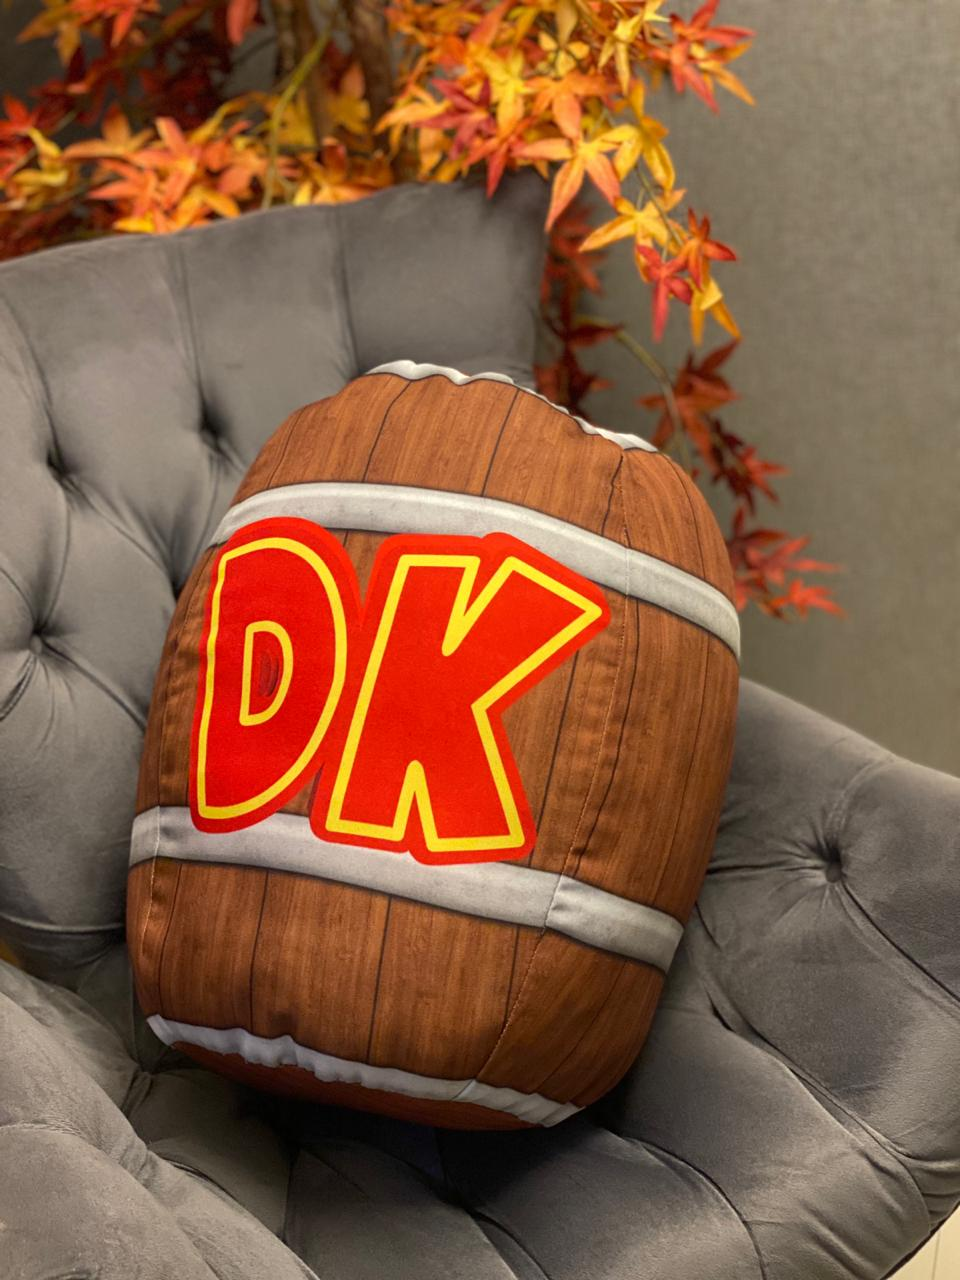 Almofada Barril:  DK - Donkey Kong